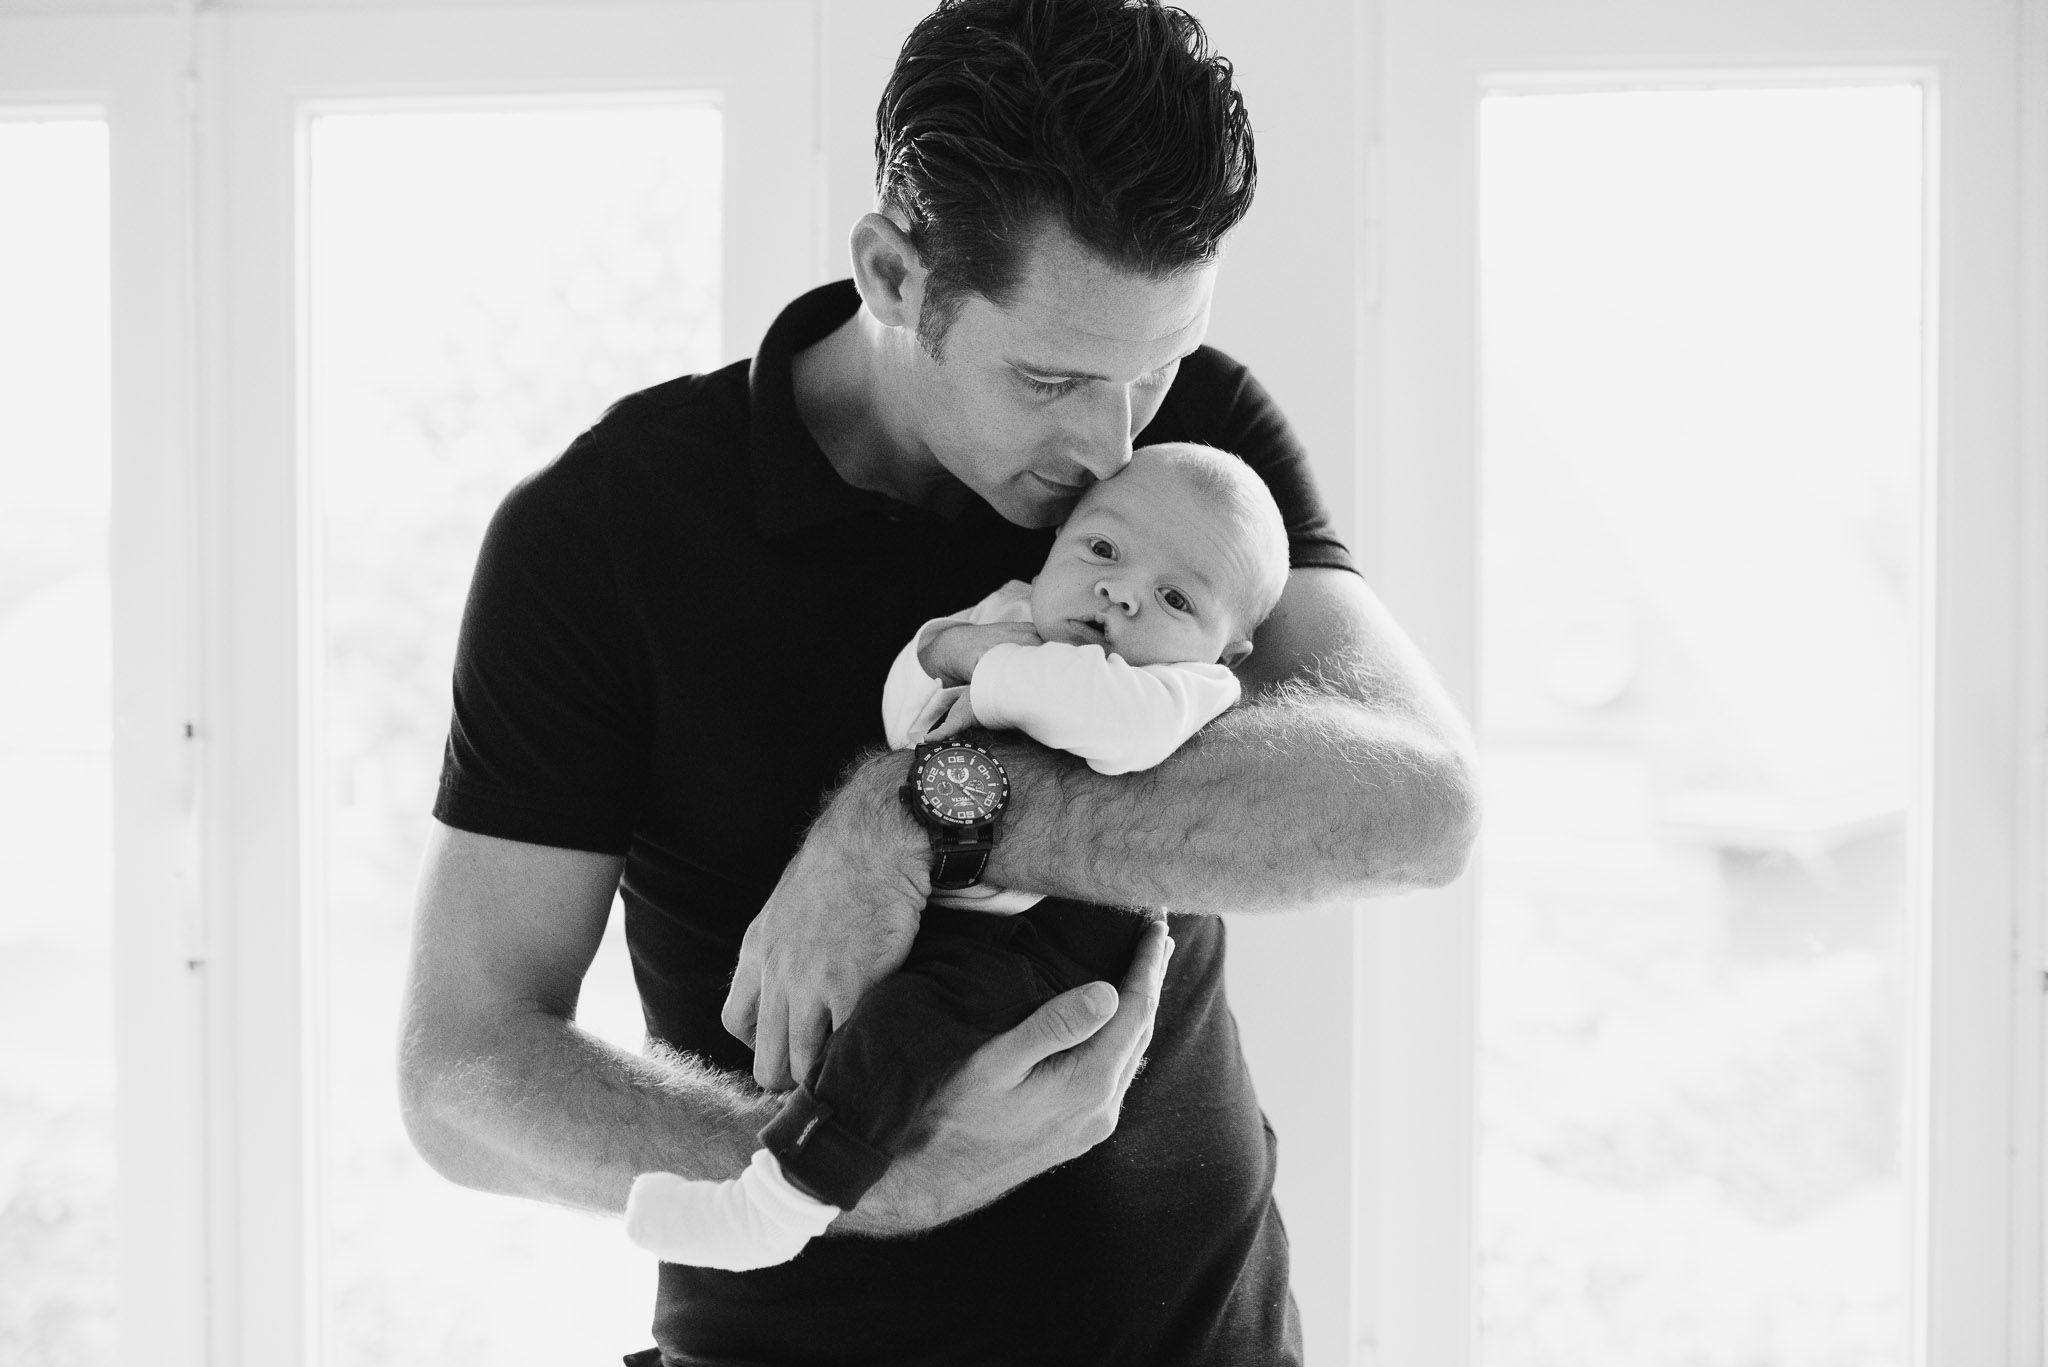 stoere newbornfoto's baby fotograaf